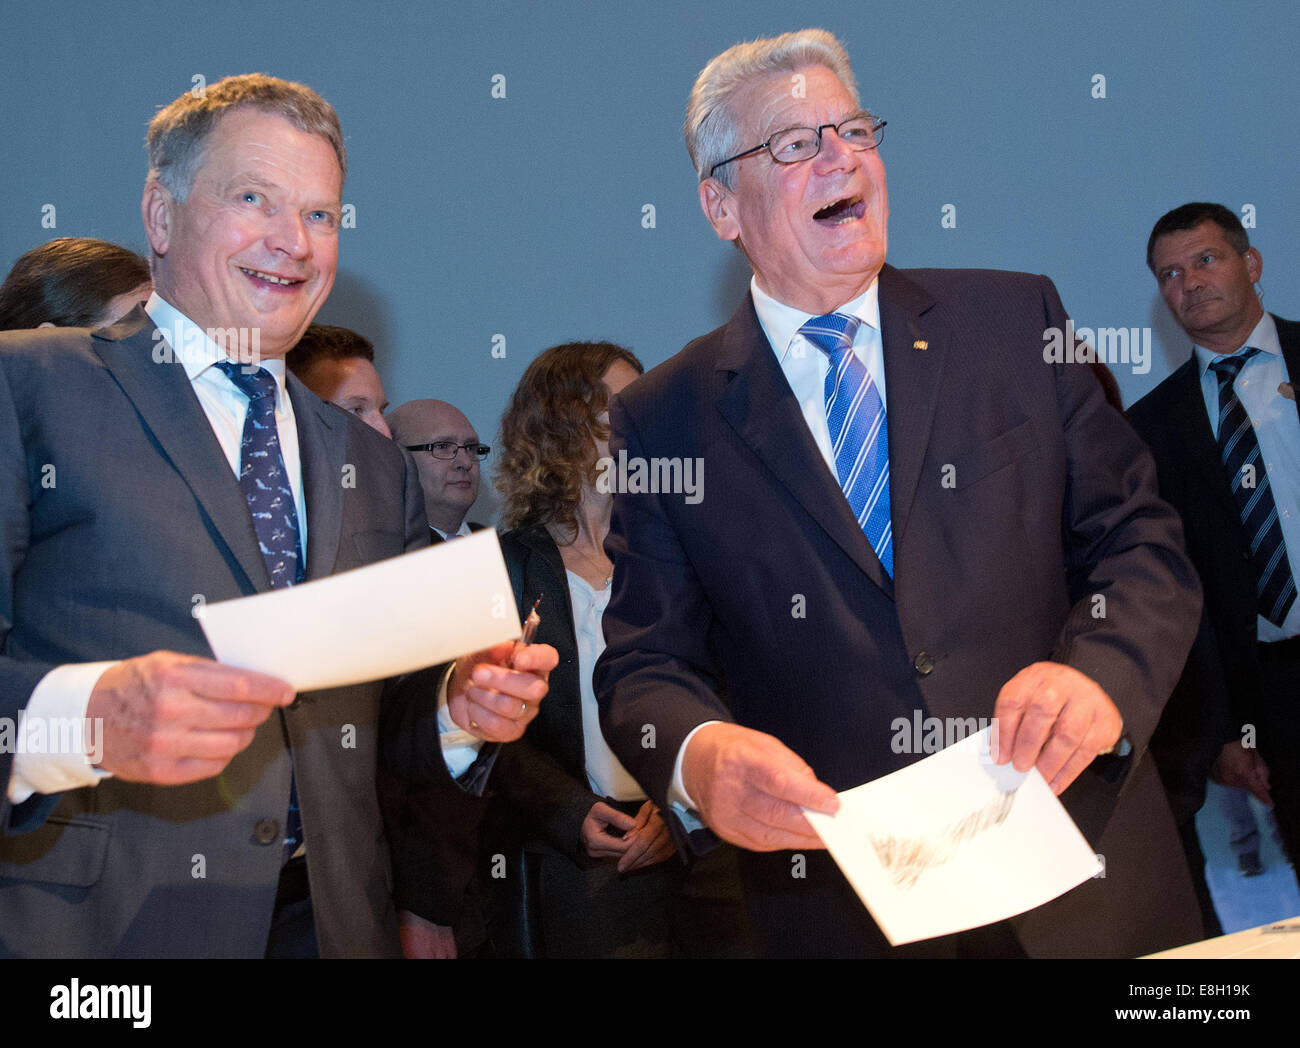 Finnish President Sauli Niinisto (L) and German President Joachim Gauck touring the Finnish Pavillion at the book - Stock Image